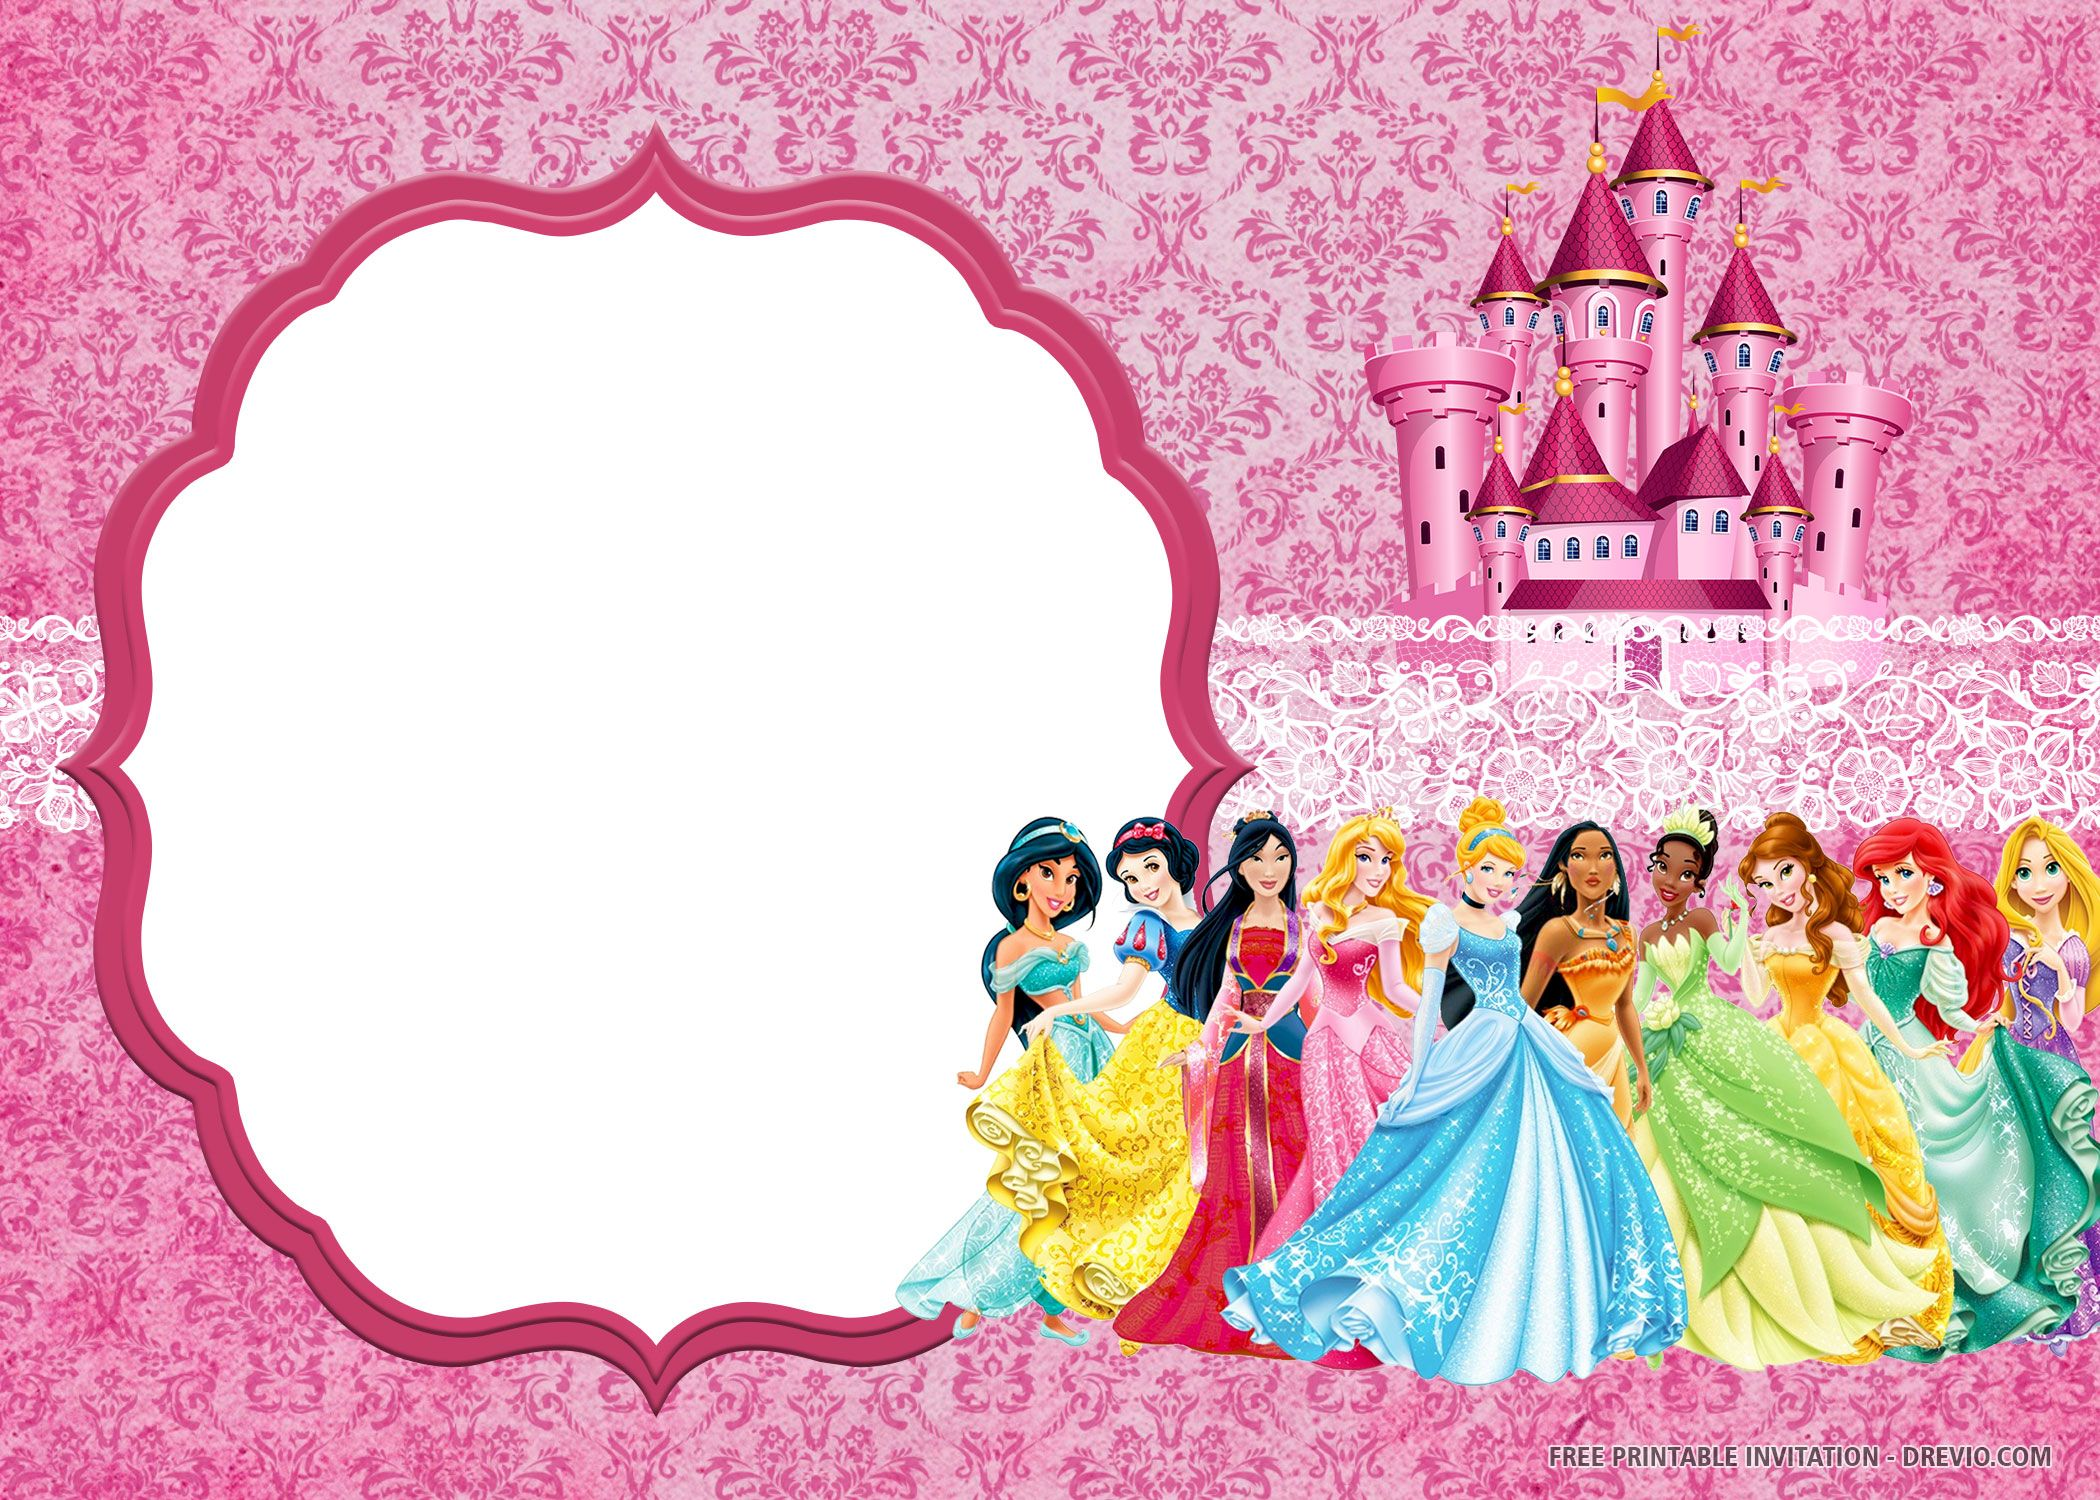 Free Printable Disney Princess Invitation Templates Disney Princess Invitations Disney Princess Party Decorations Princess Invitations